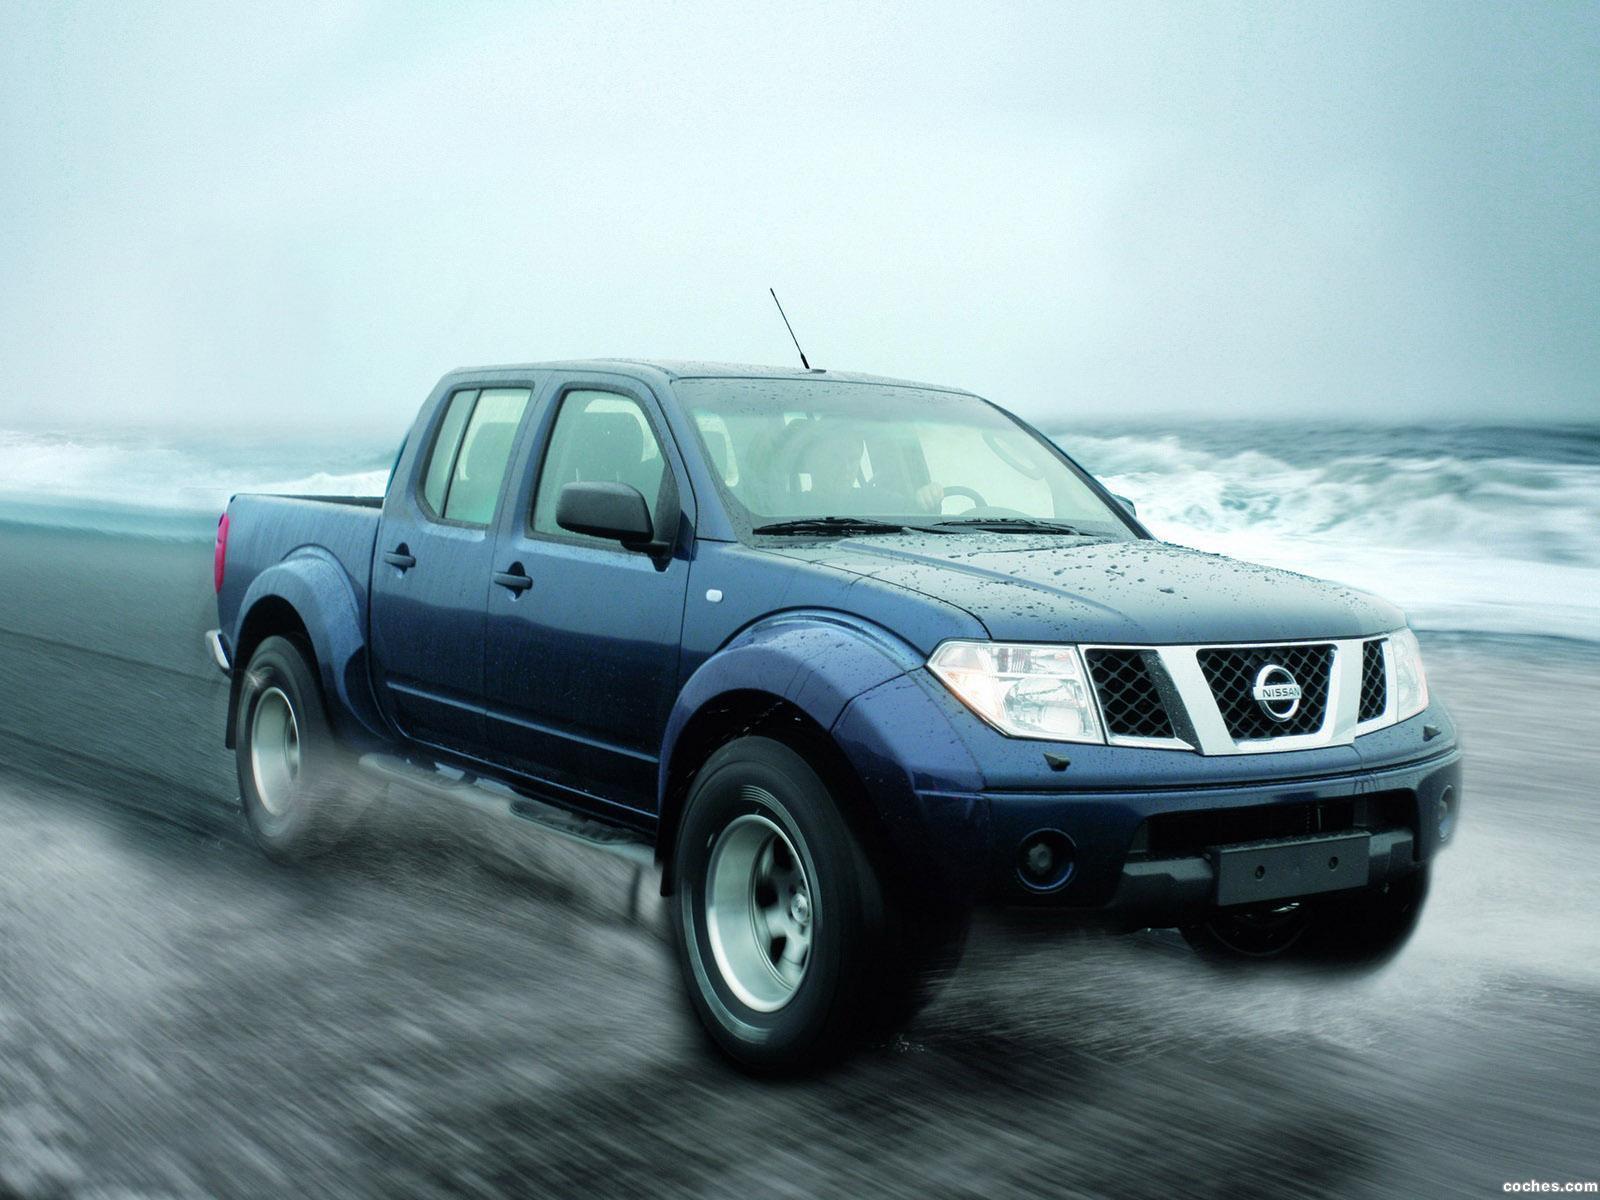 arctic-trucks_nissan-navara-double-cab-at35-d40-2005-10_r4.jpg